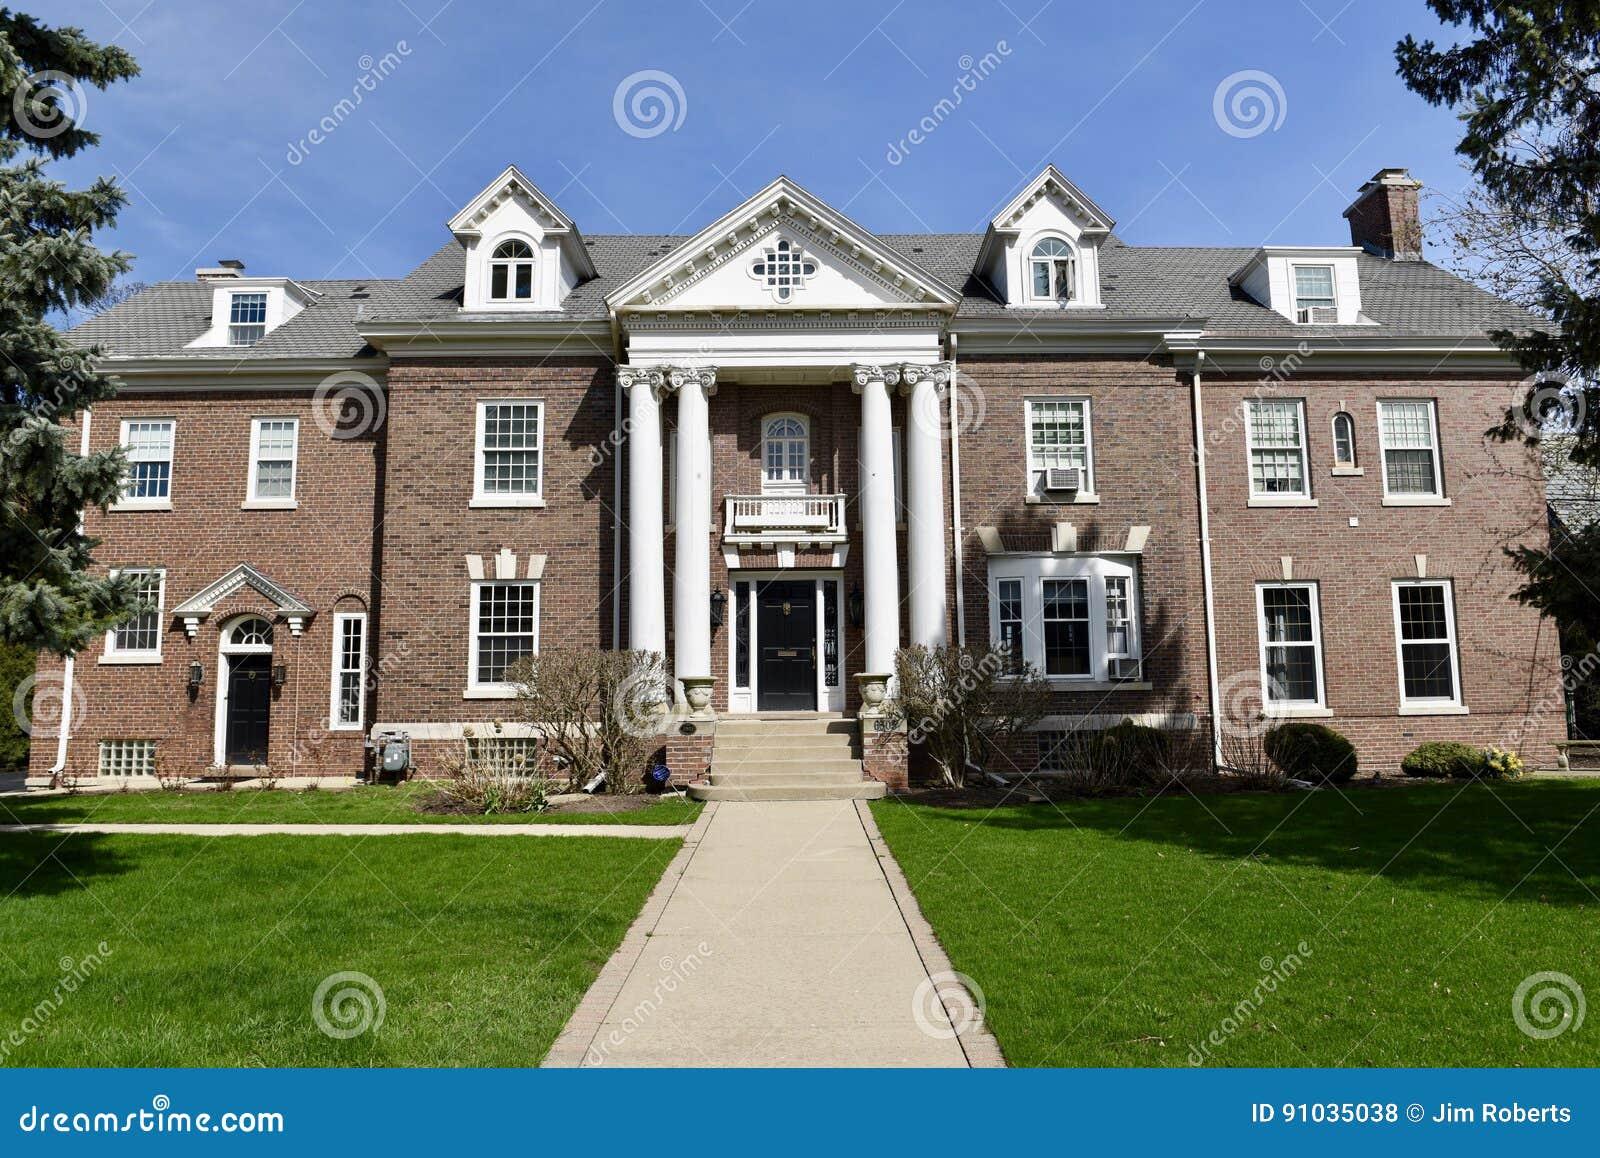 Charles Chester Allen House